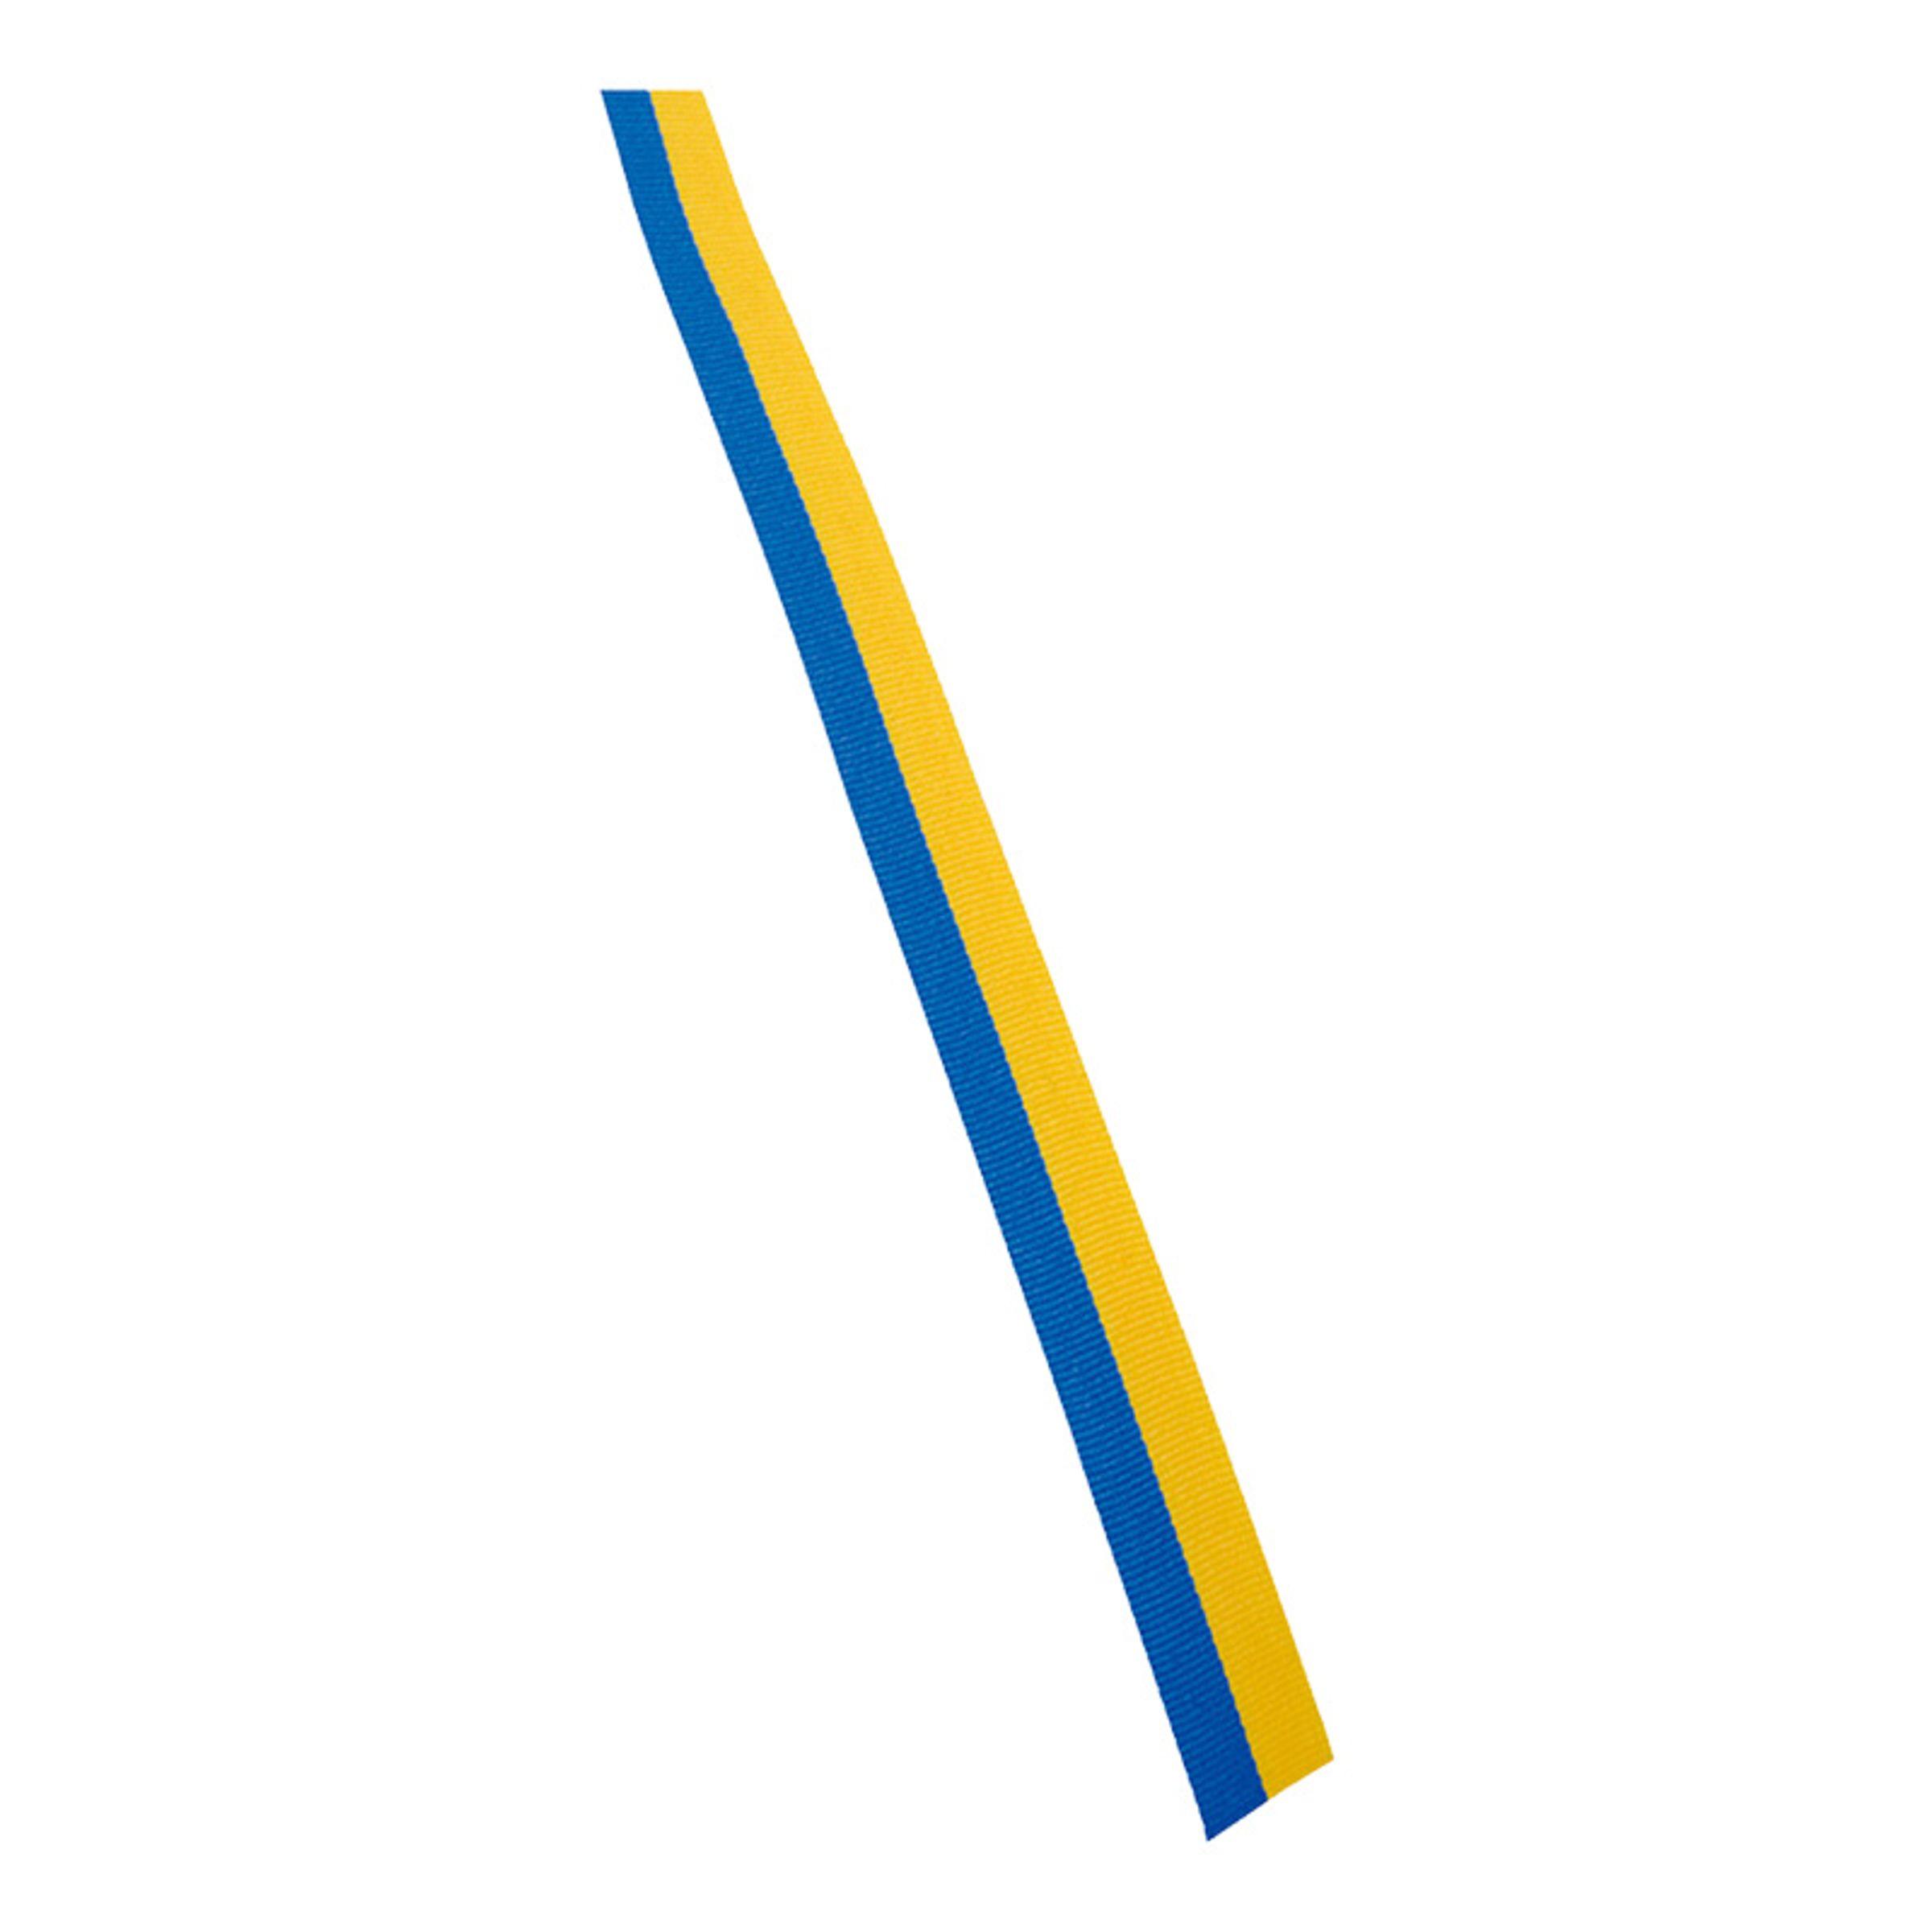 Sverigeband Blå/Gul - 5cmx4m